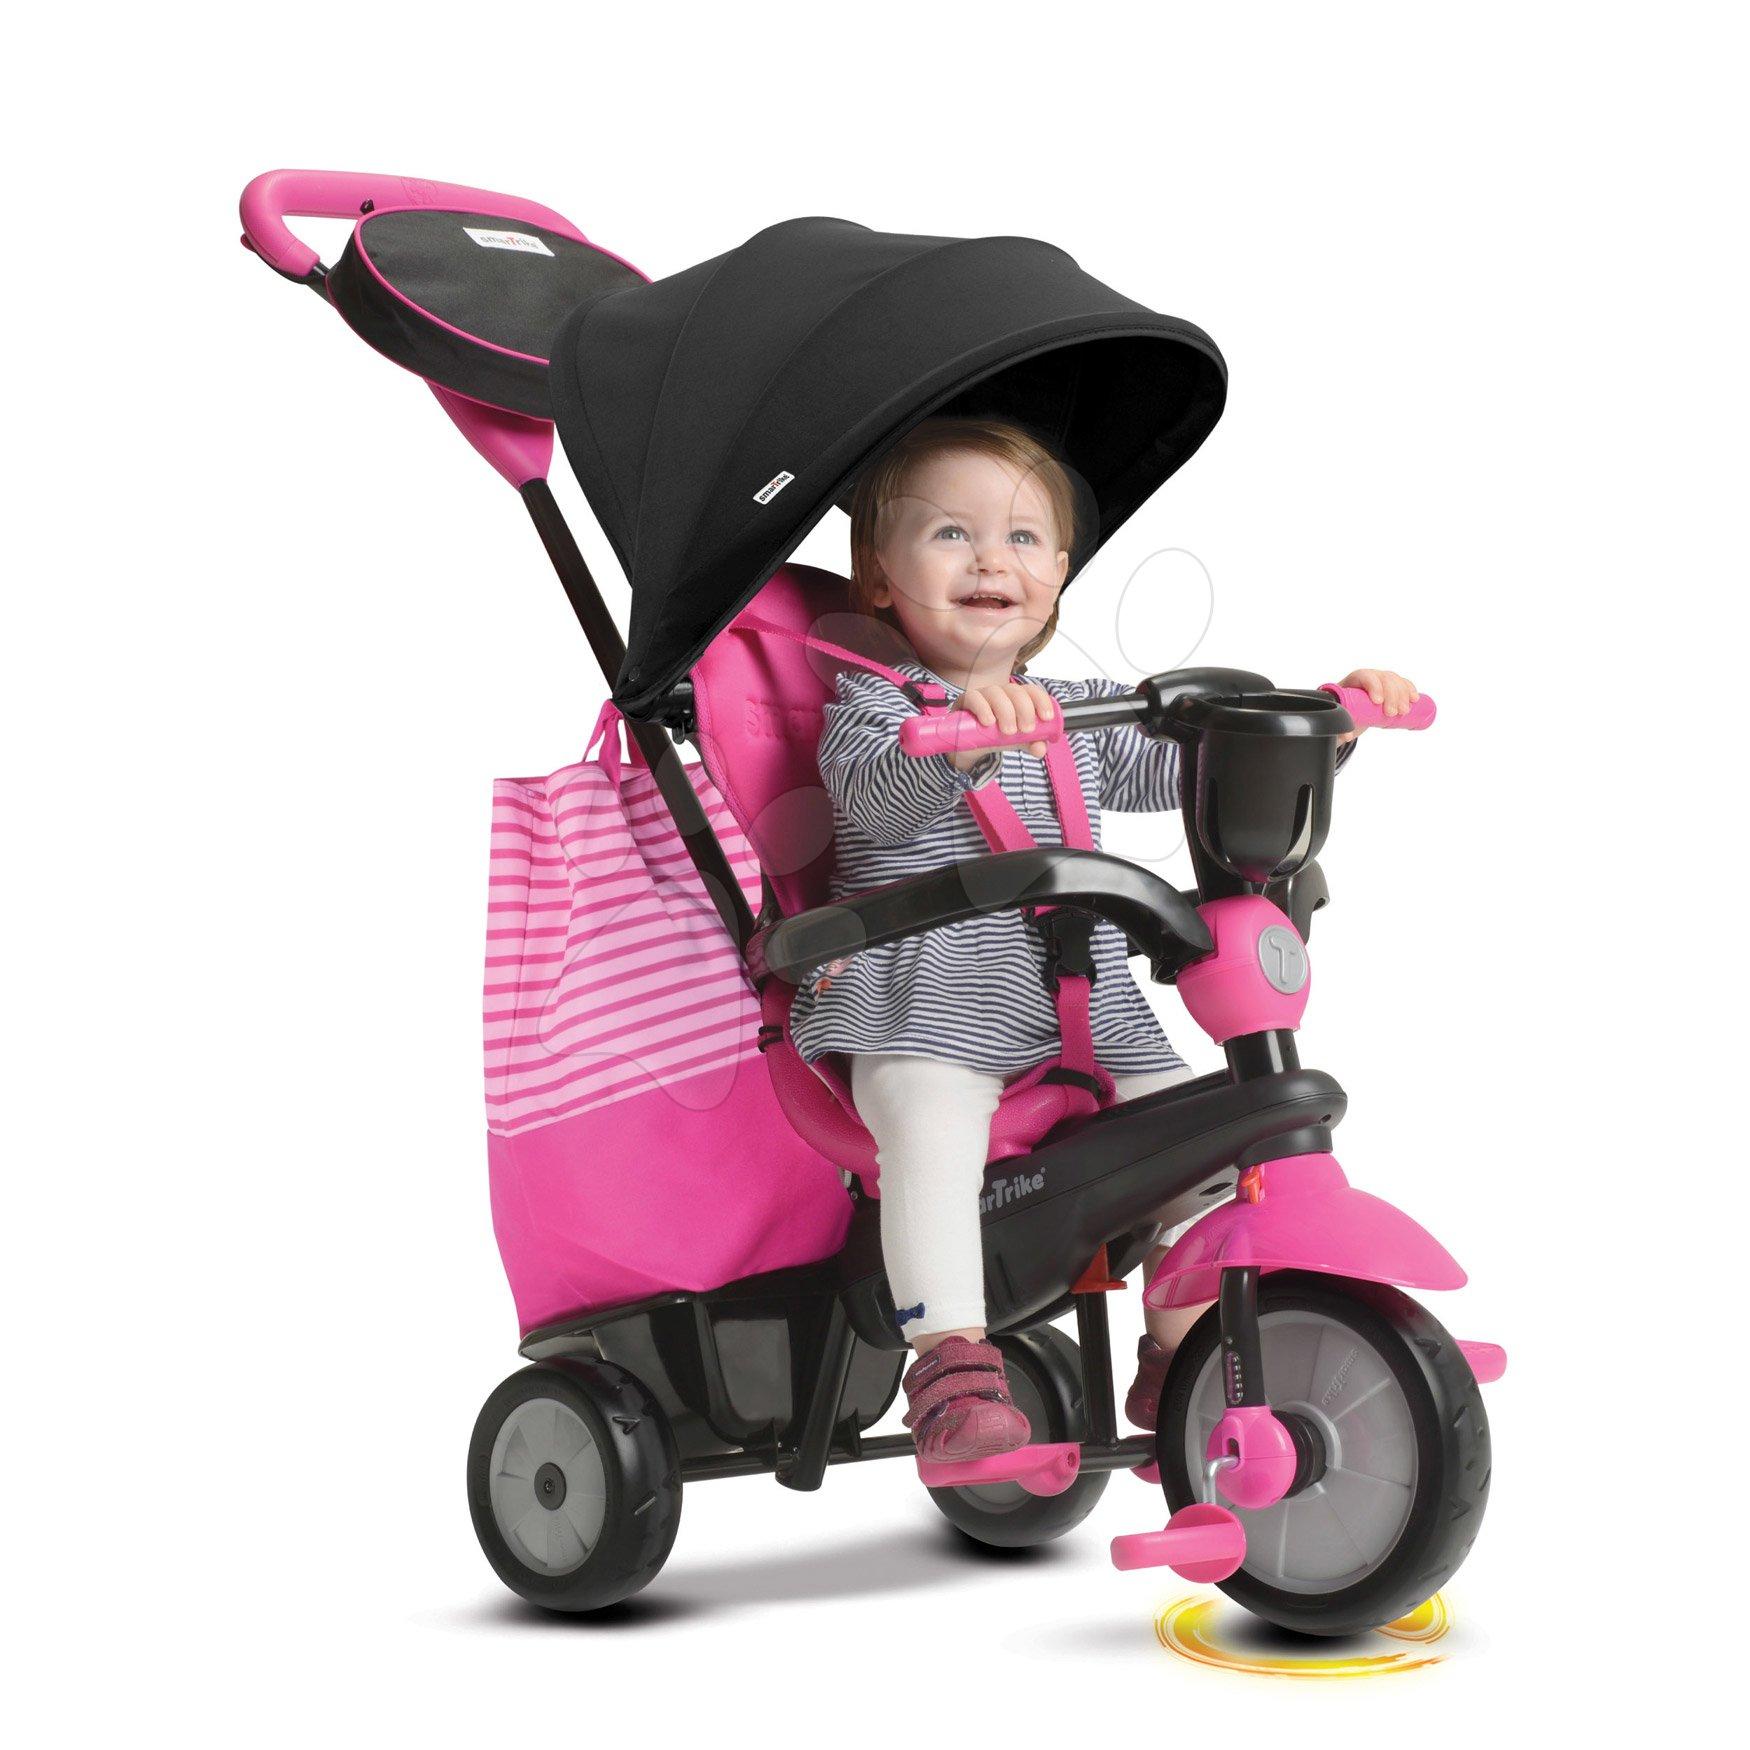 Trojkolka SWING DLX 4v1 Pink TouchSteering smarTrike s tlmičom a voľnobehom + UV filter, ružová od 10 mes